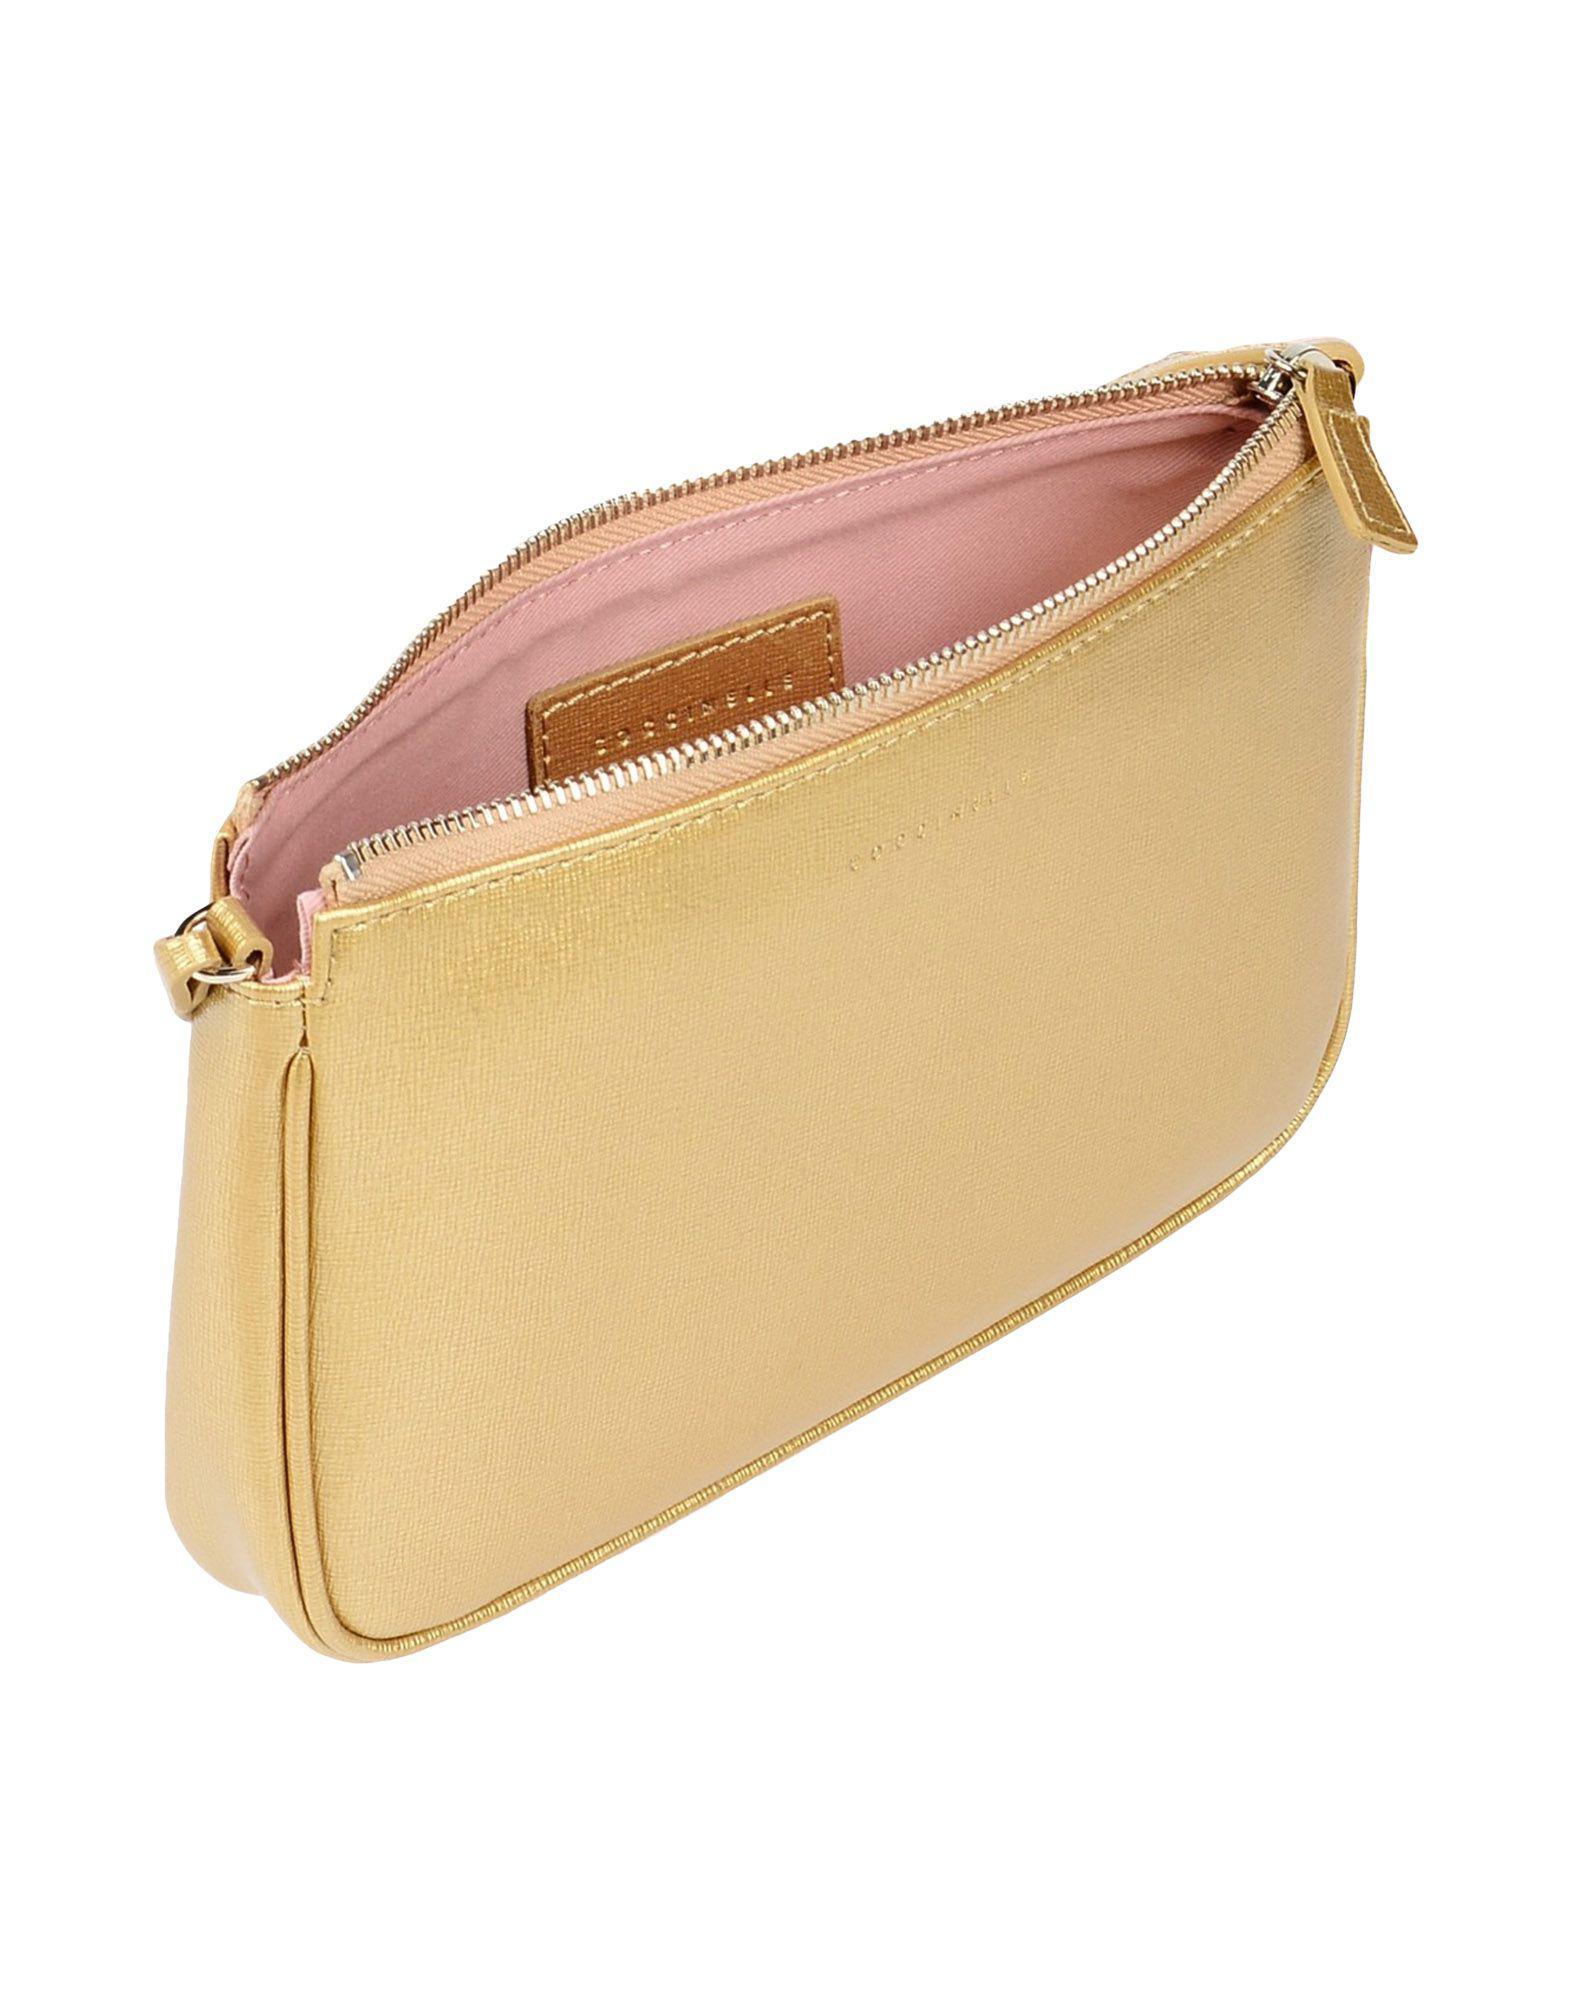 Coccinelle Cross-body Bag in Gold (Metallic)